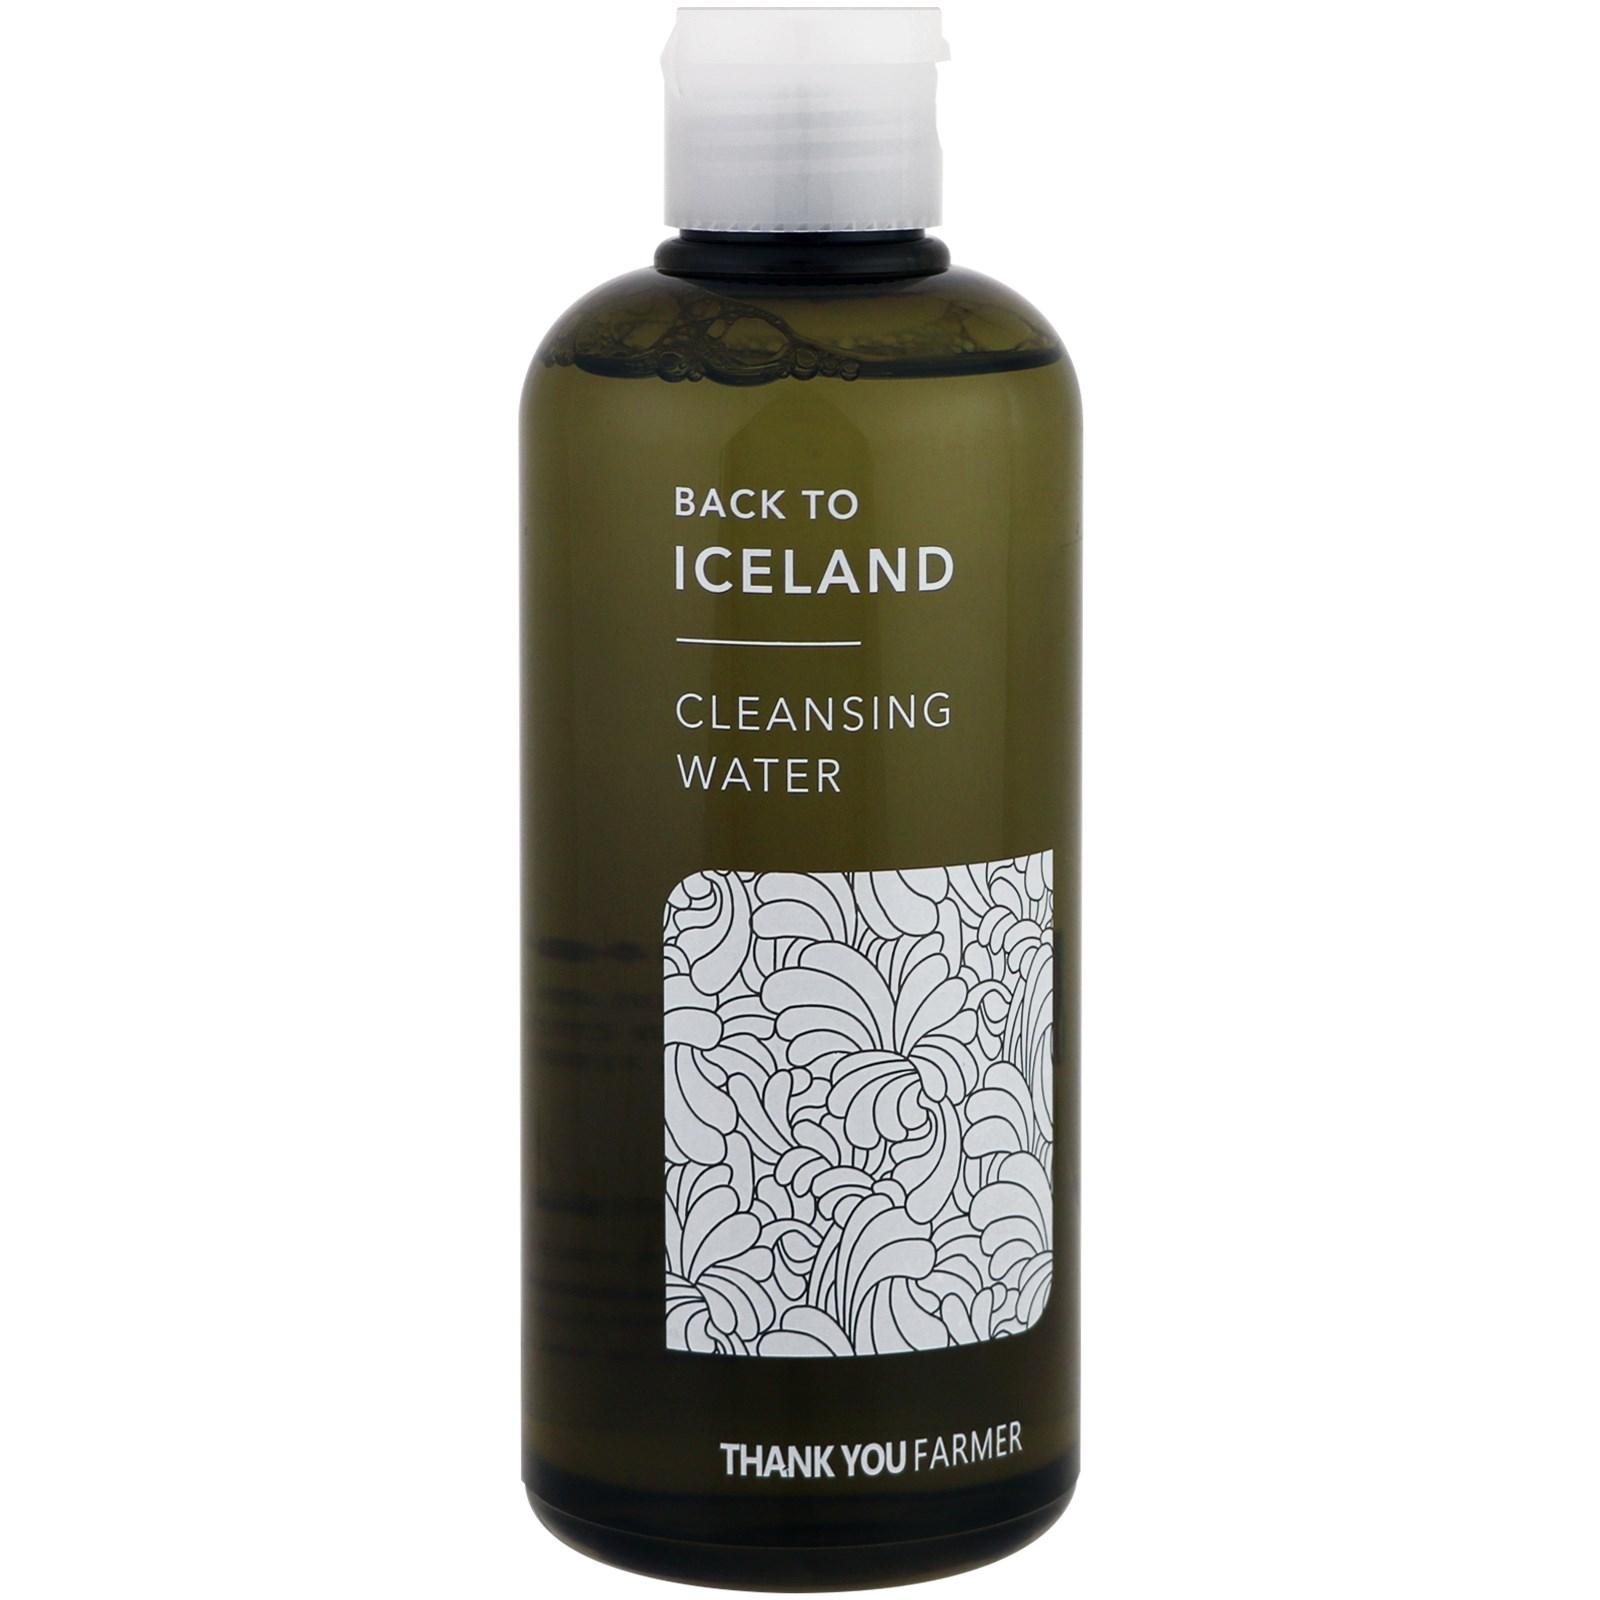 Thank You Farmer, Back to Iceland, Cleansing Water , 9.15 fl oz(pack of 4) Hawaiian Pineapple Enzyme Facial Scrub Alba Botanica 4 oz Liquid